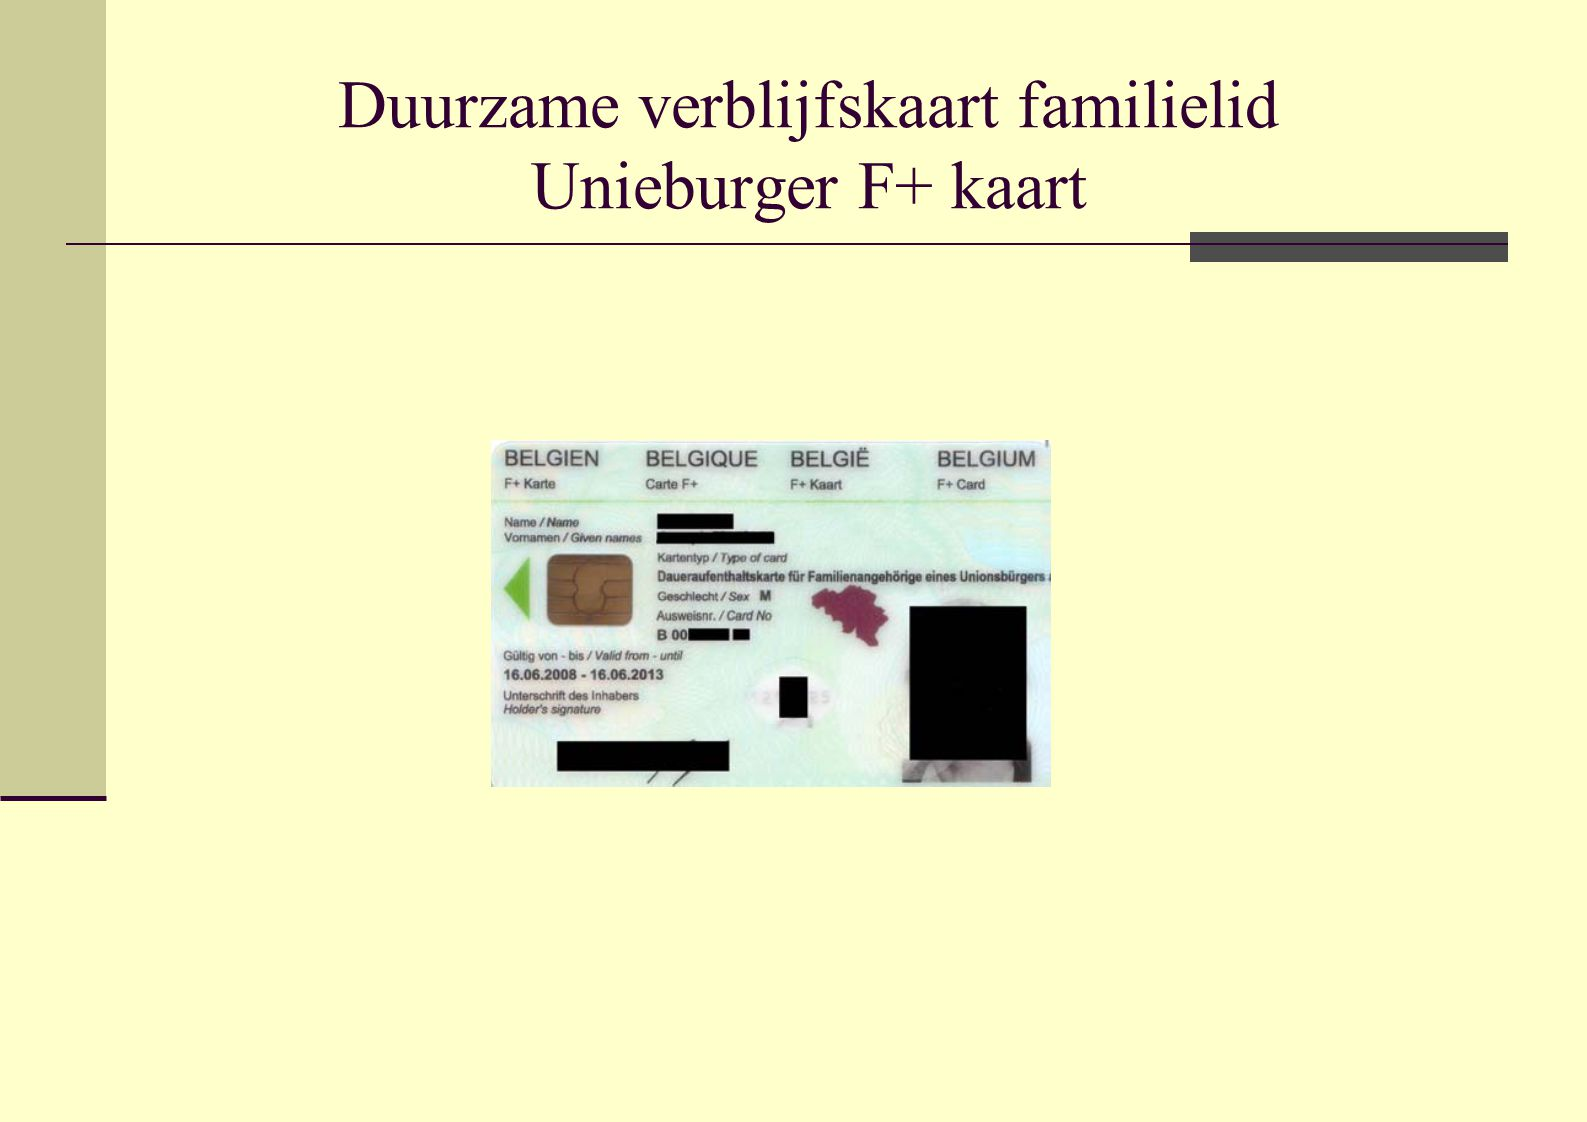 Duurzame verblijfskaart familielid Unieburger F+ kaart